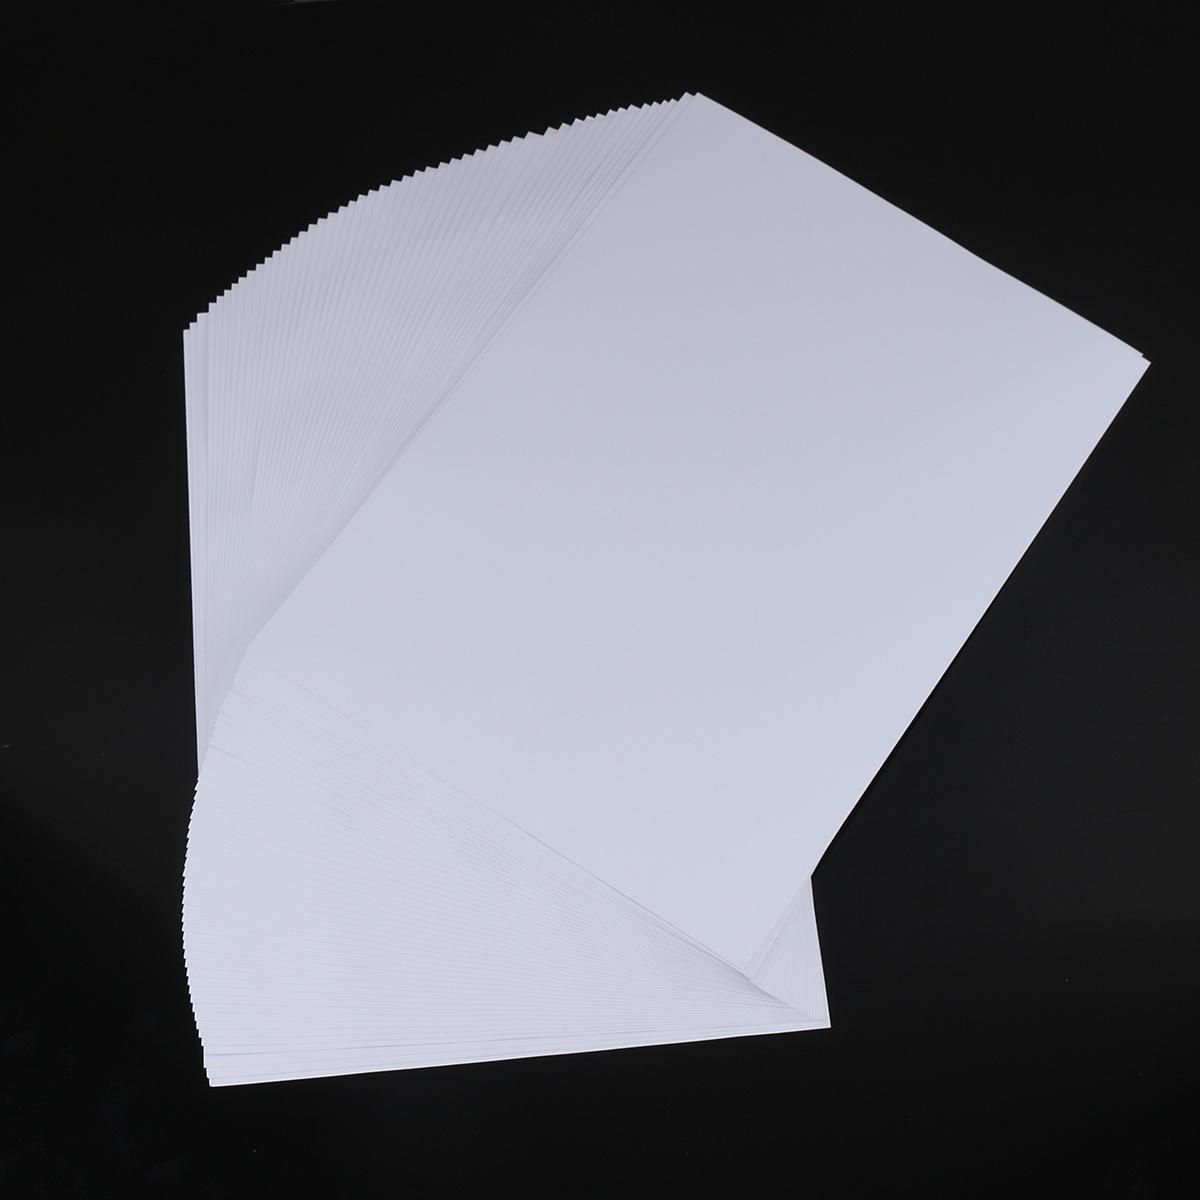 Pairi 50Pcs Waterproof A4 Self Adhesive Glossy Paper Sticker for Photographic Photo Inkjet Printer Paper Craft Paper